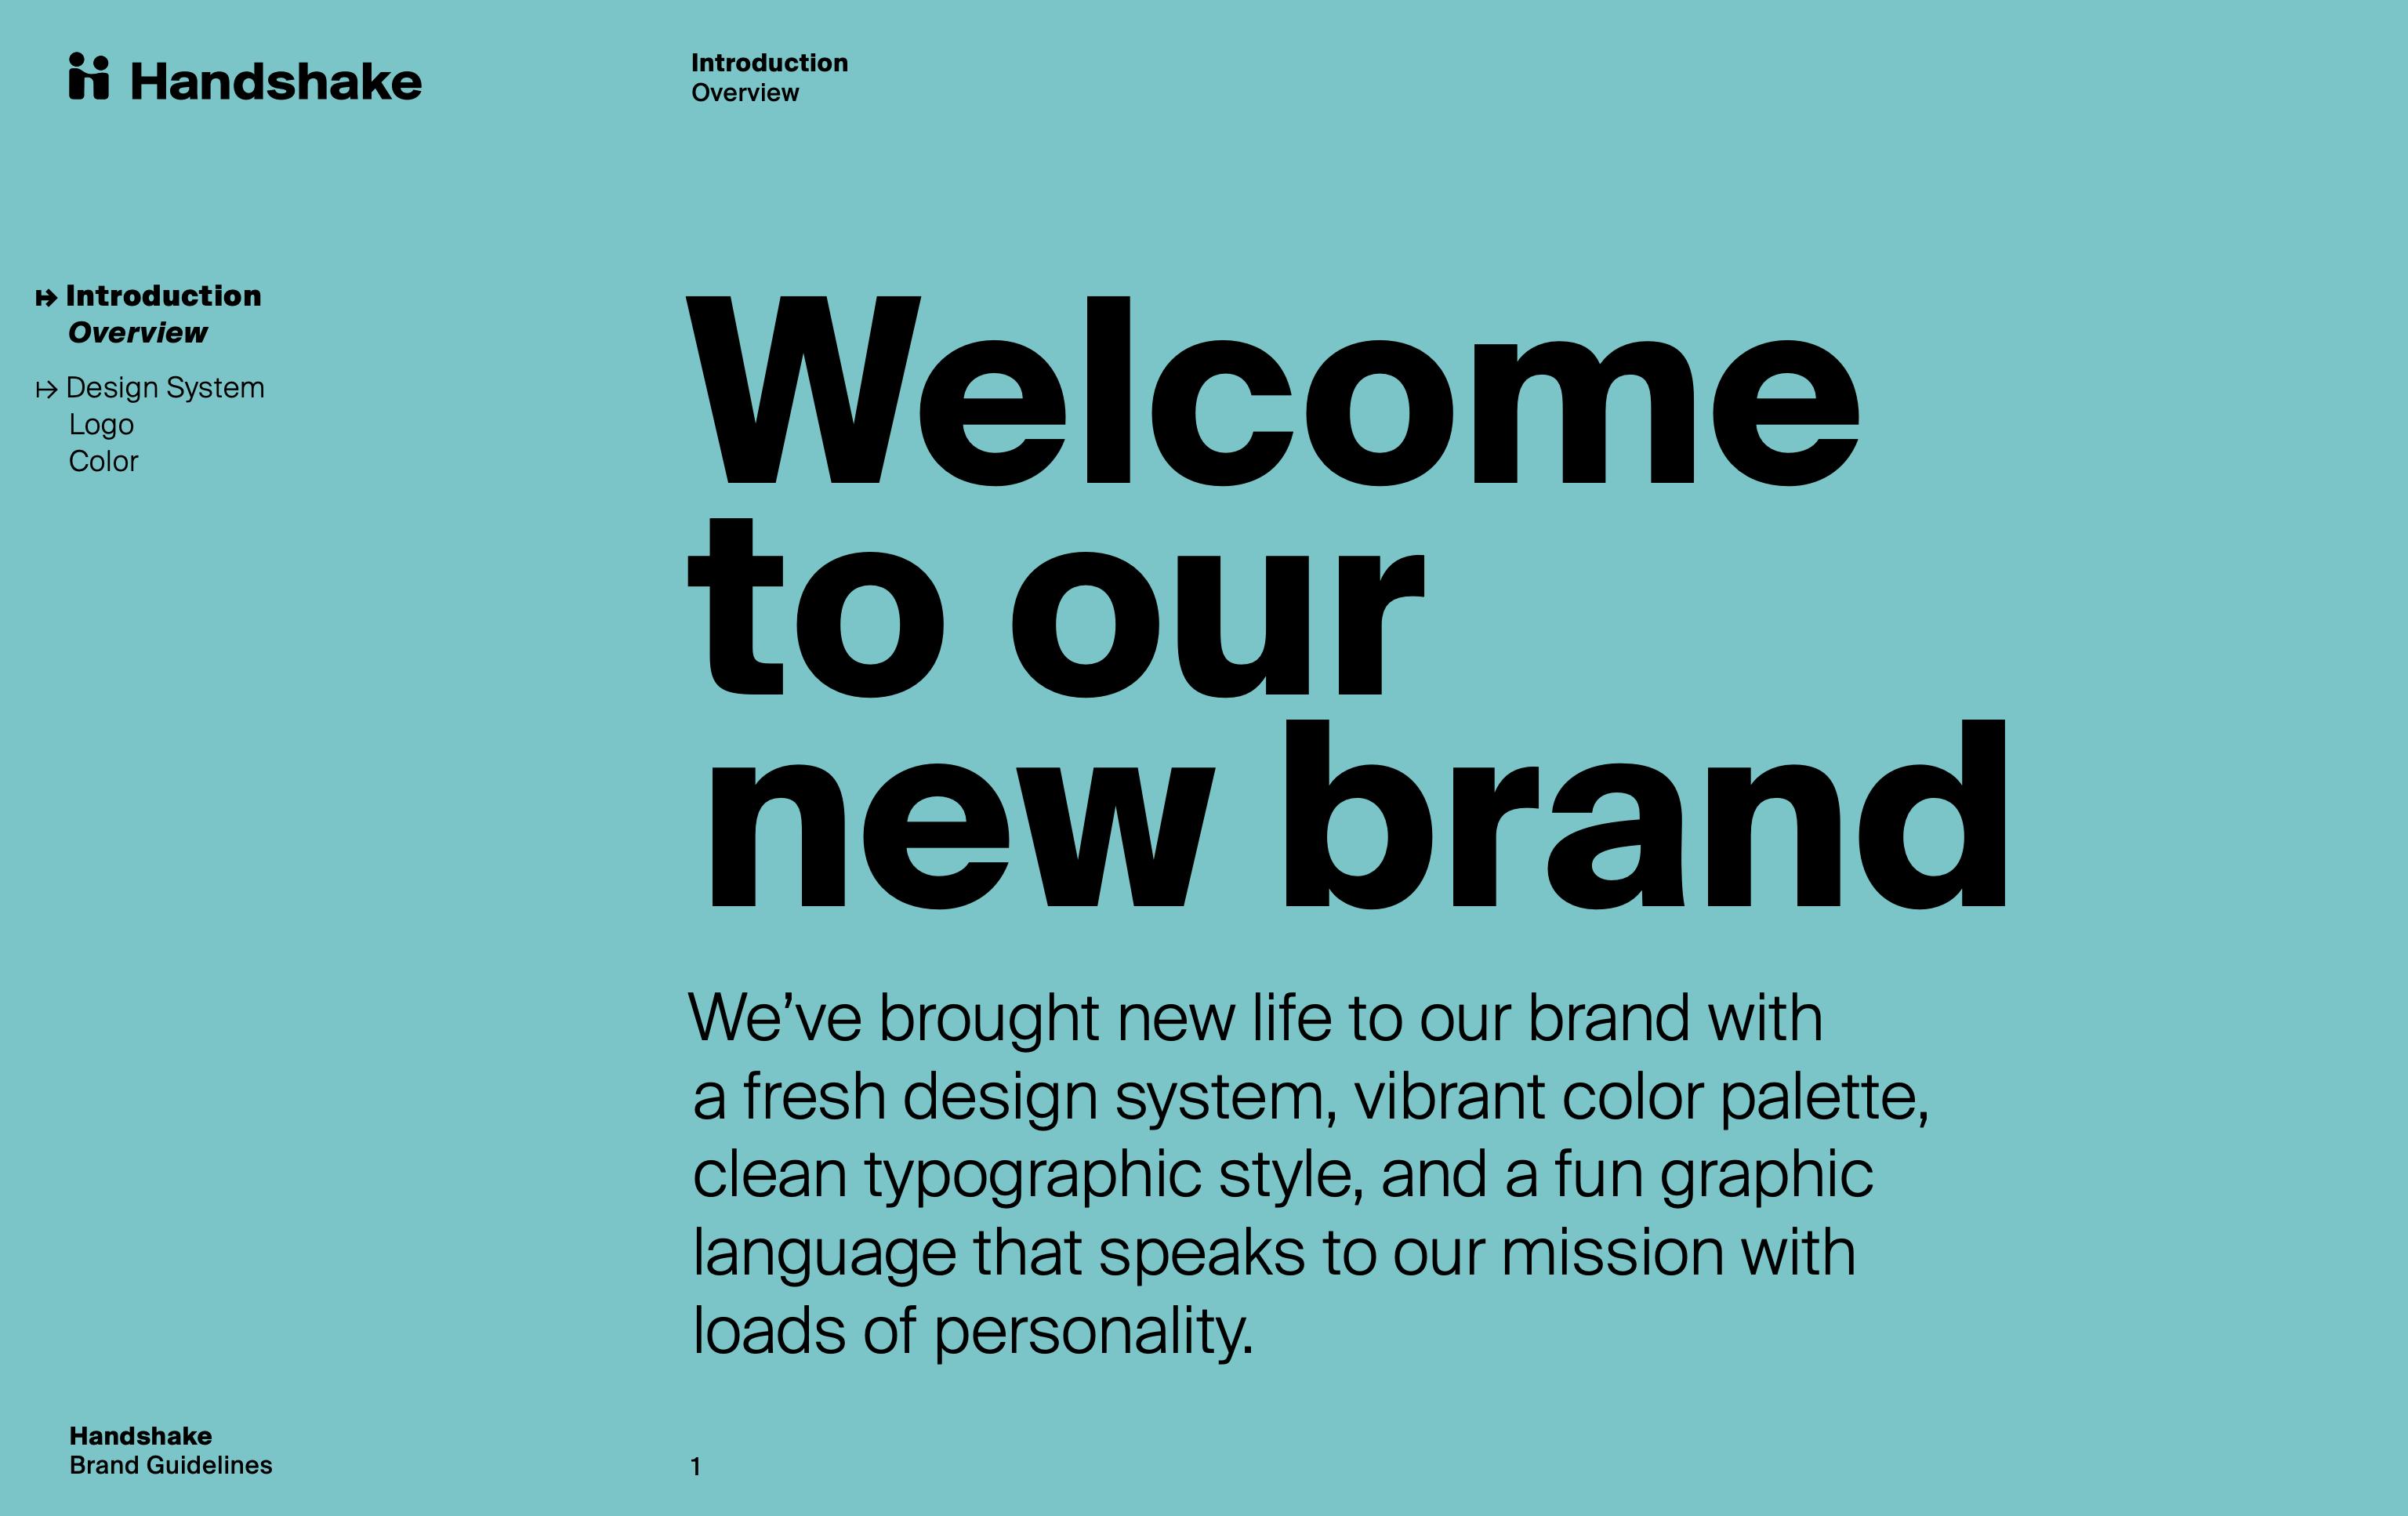 Handshake Brand Guidelines